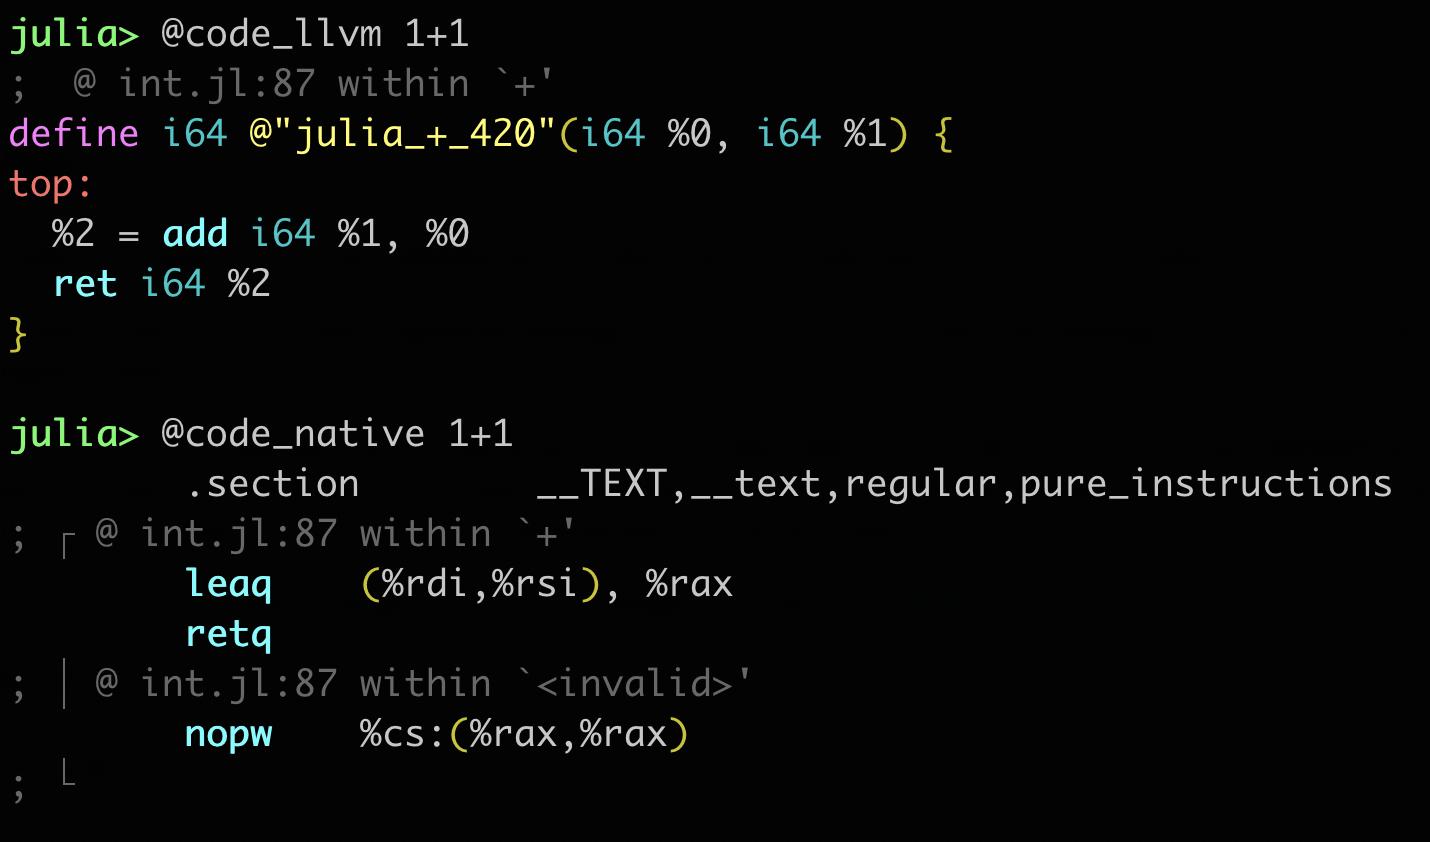 Julia 1.6 code_llvm